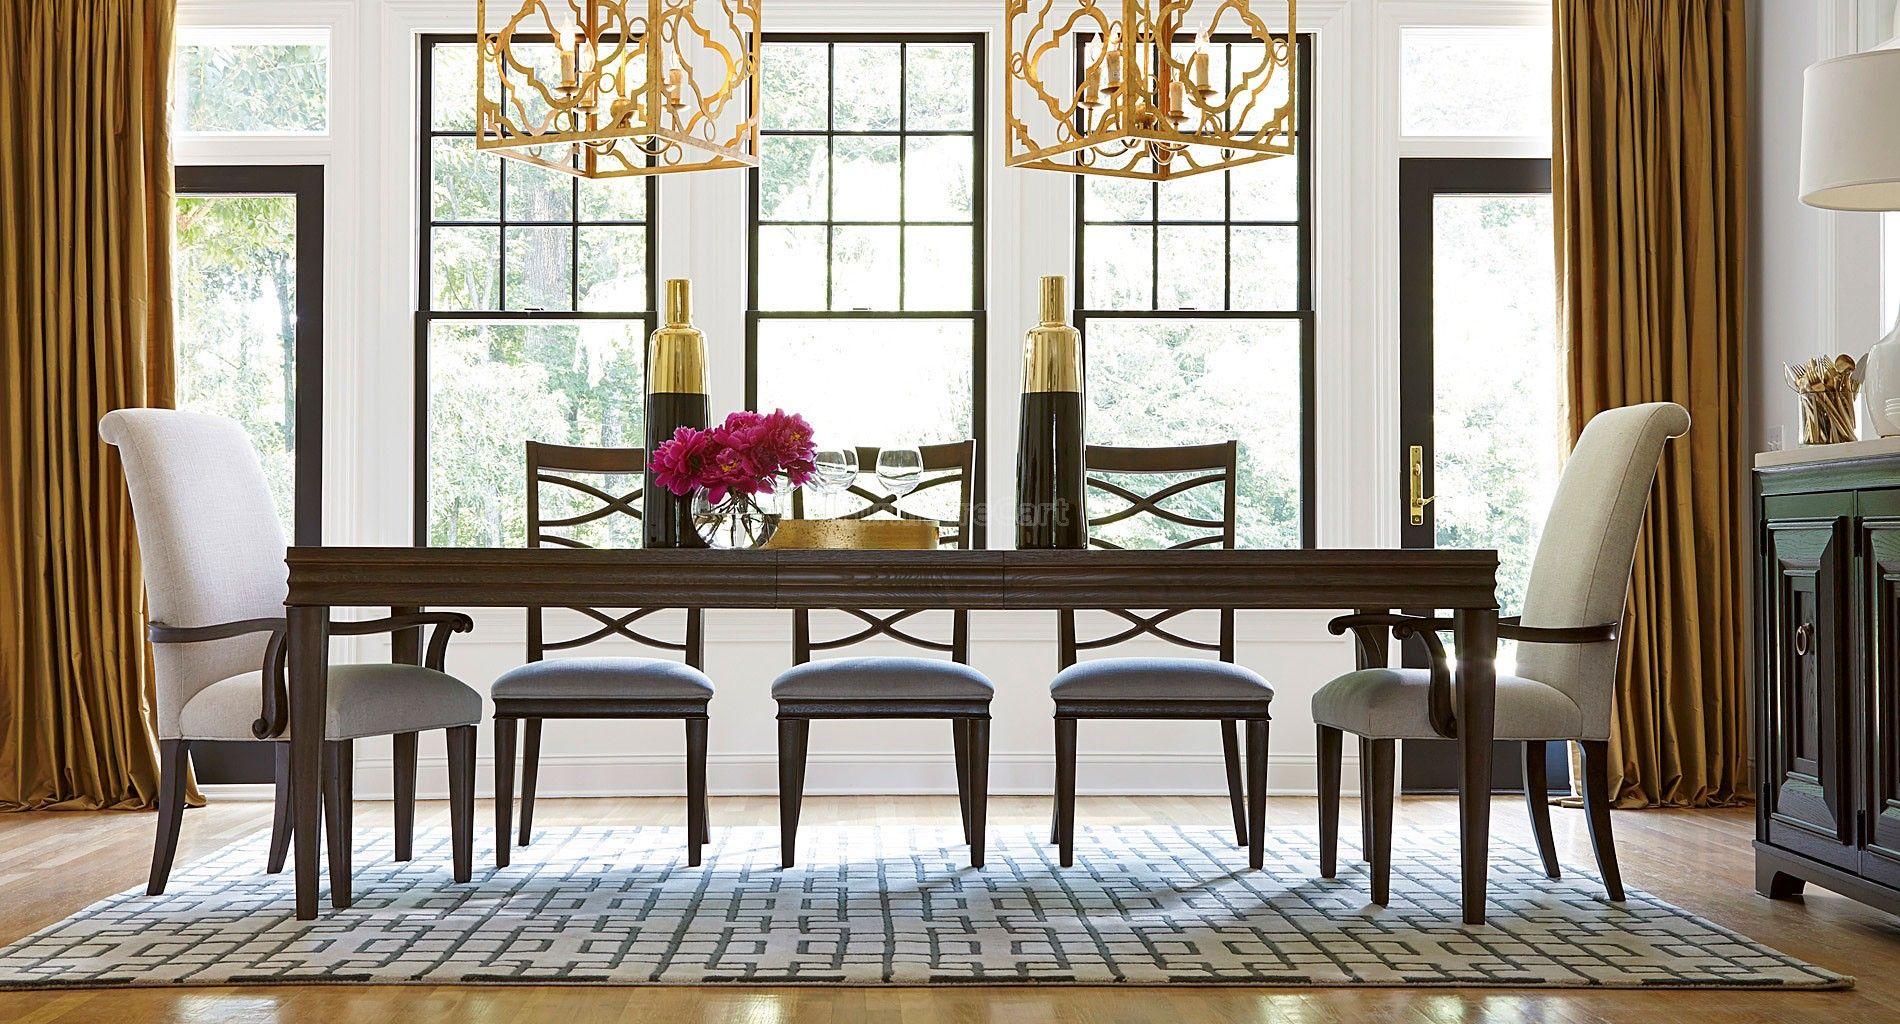 Small Yet Elegant Dining Room Set Up Dining Furniture Designs